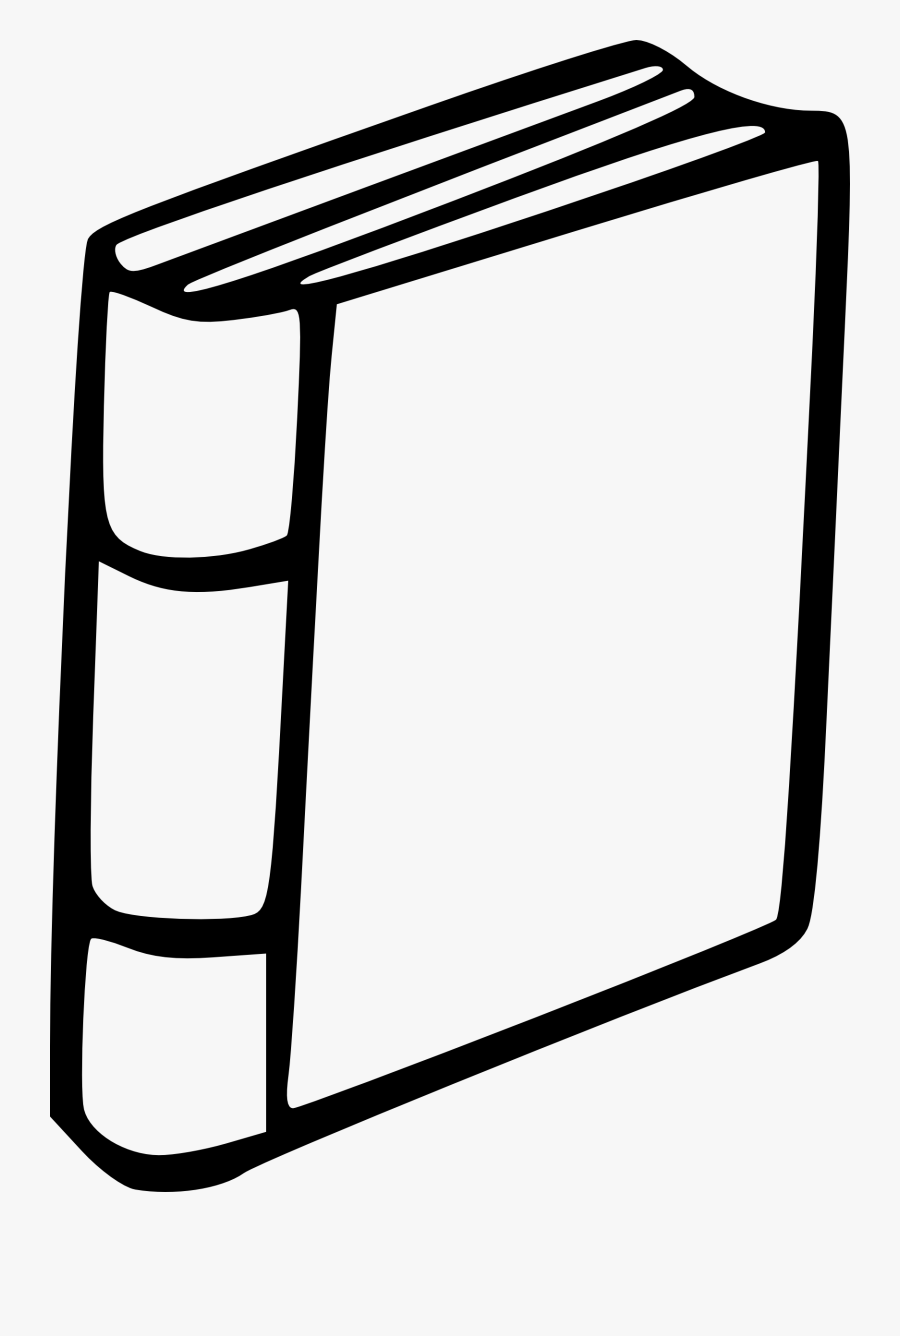 Other Clipart Eci Book - Book Spine Clip Art, Transparent Clipart